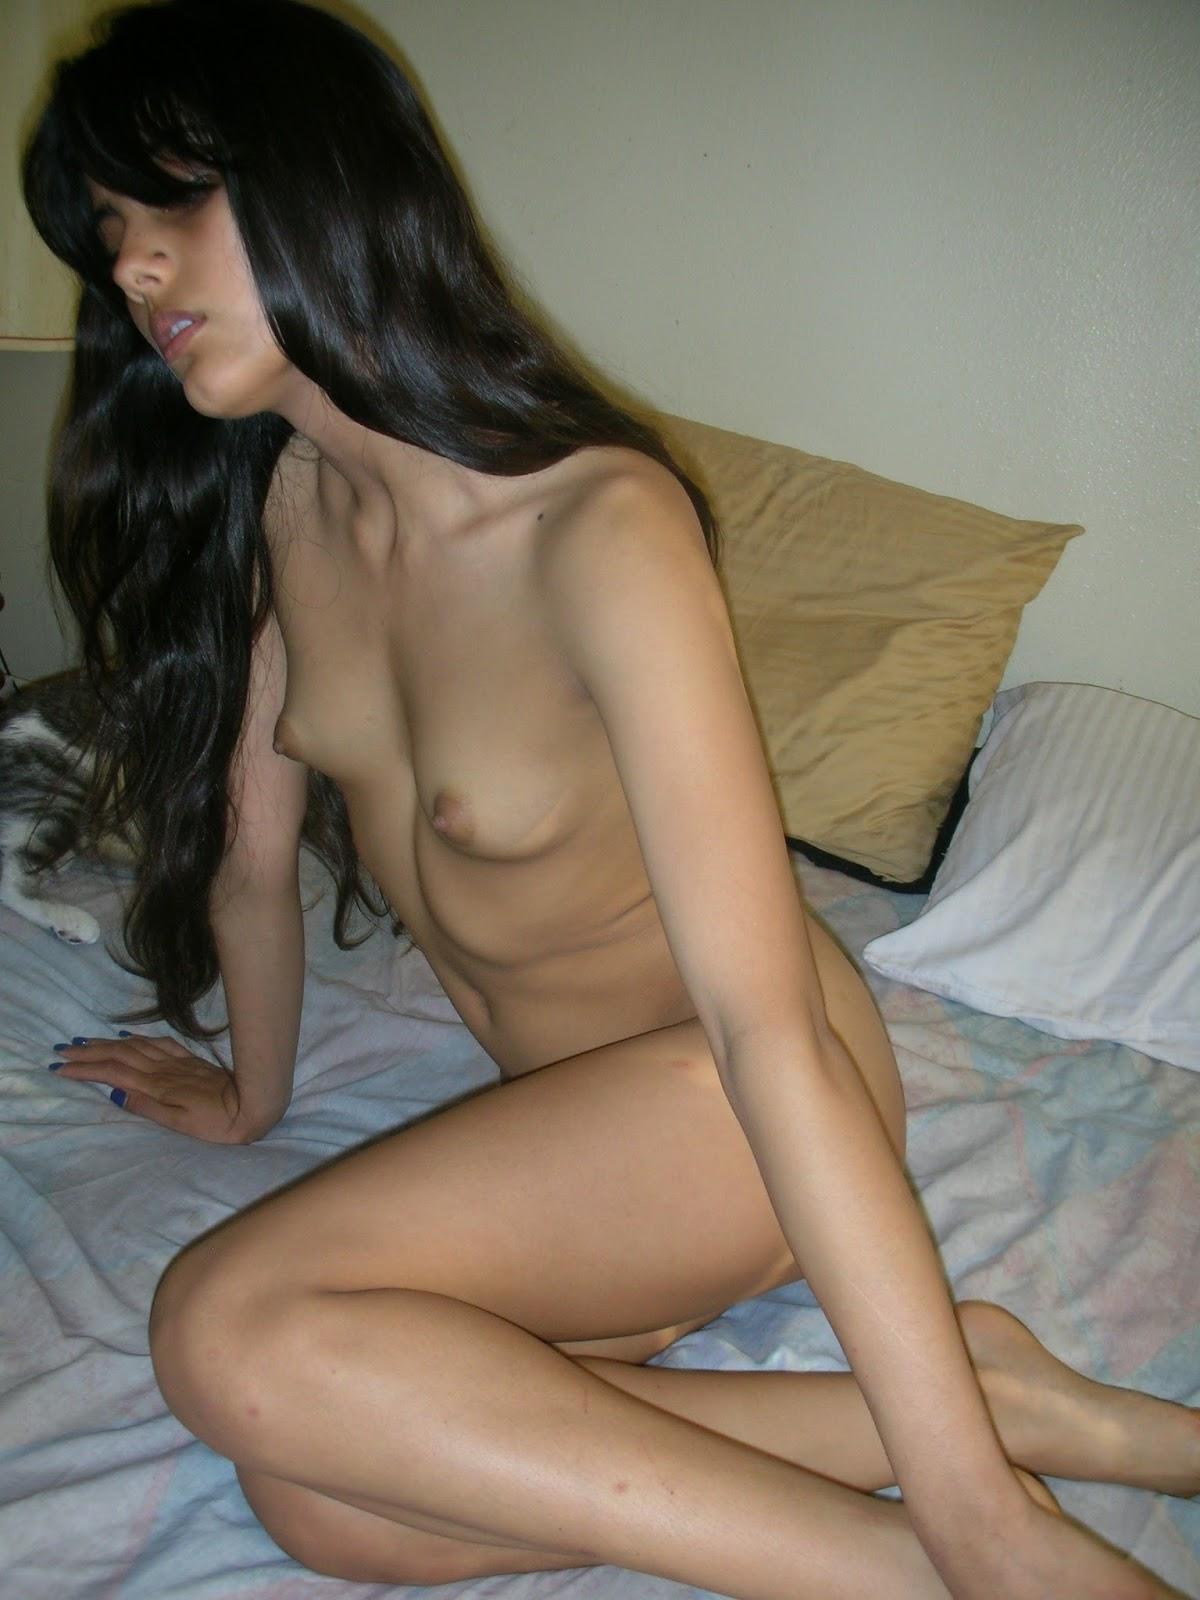 Chennai Nude Women